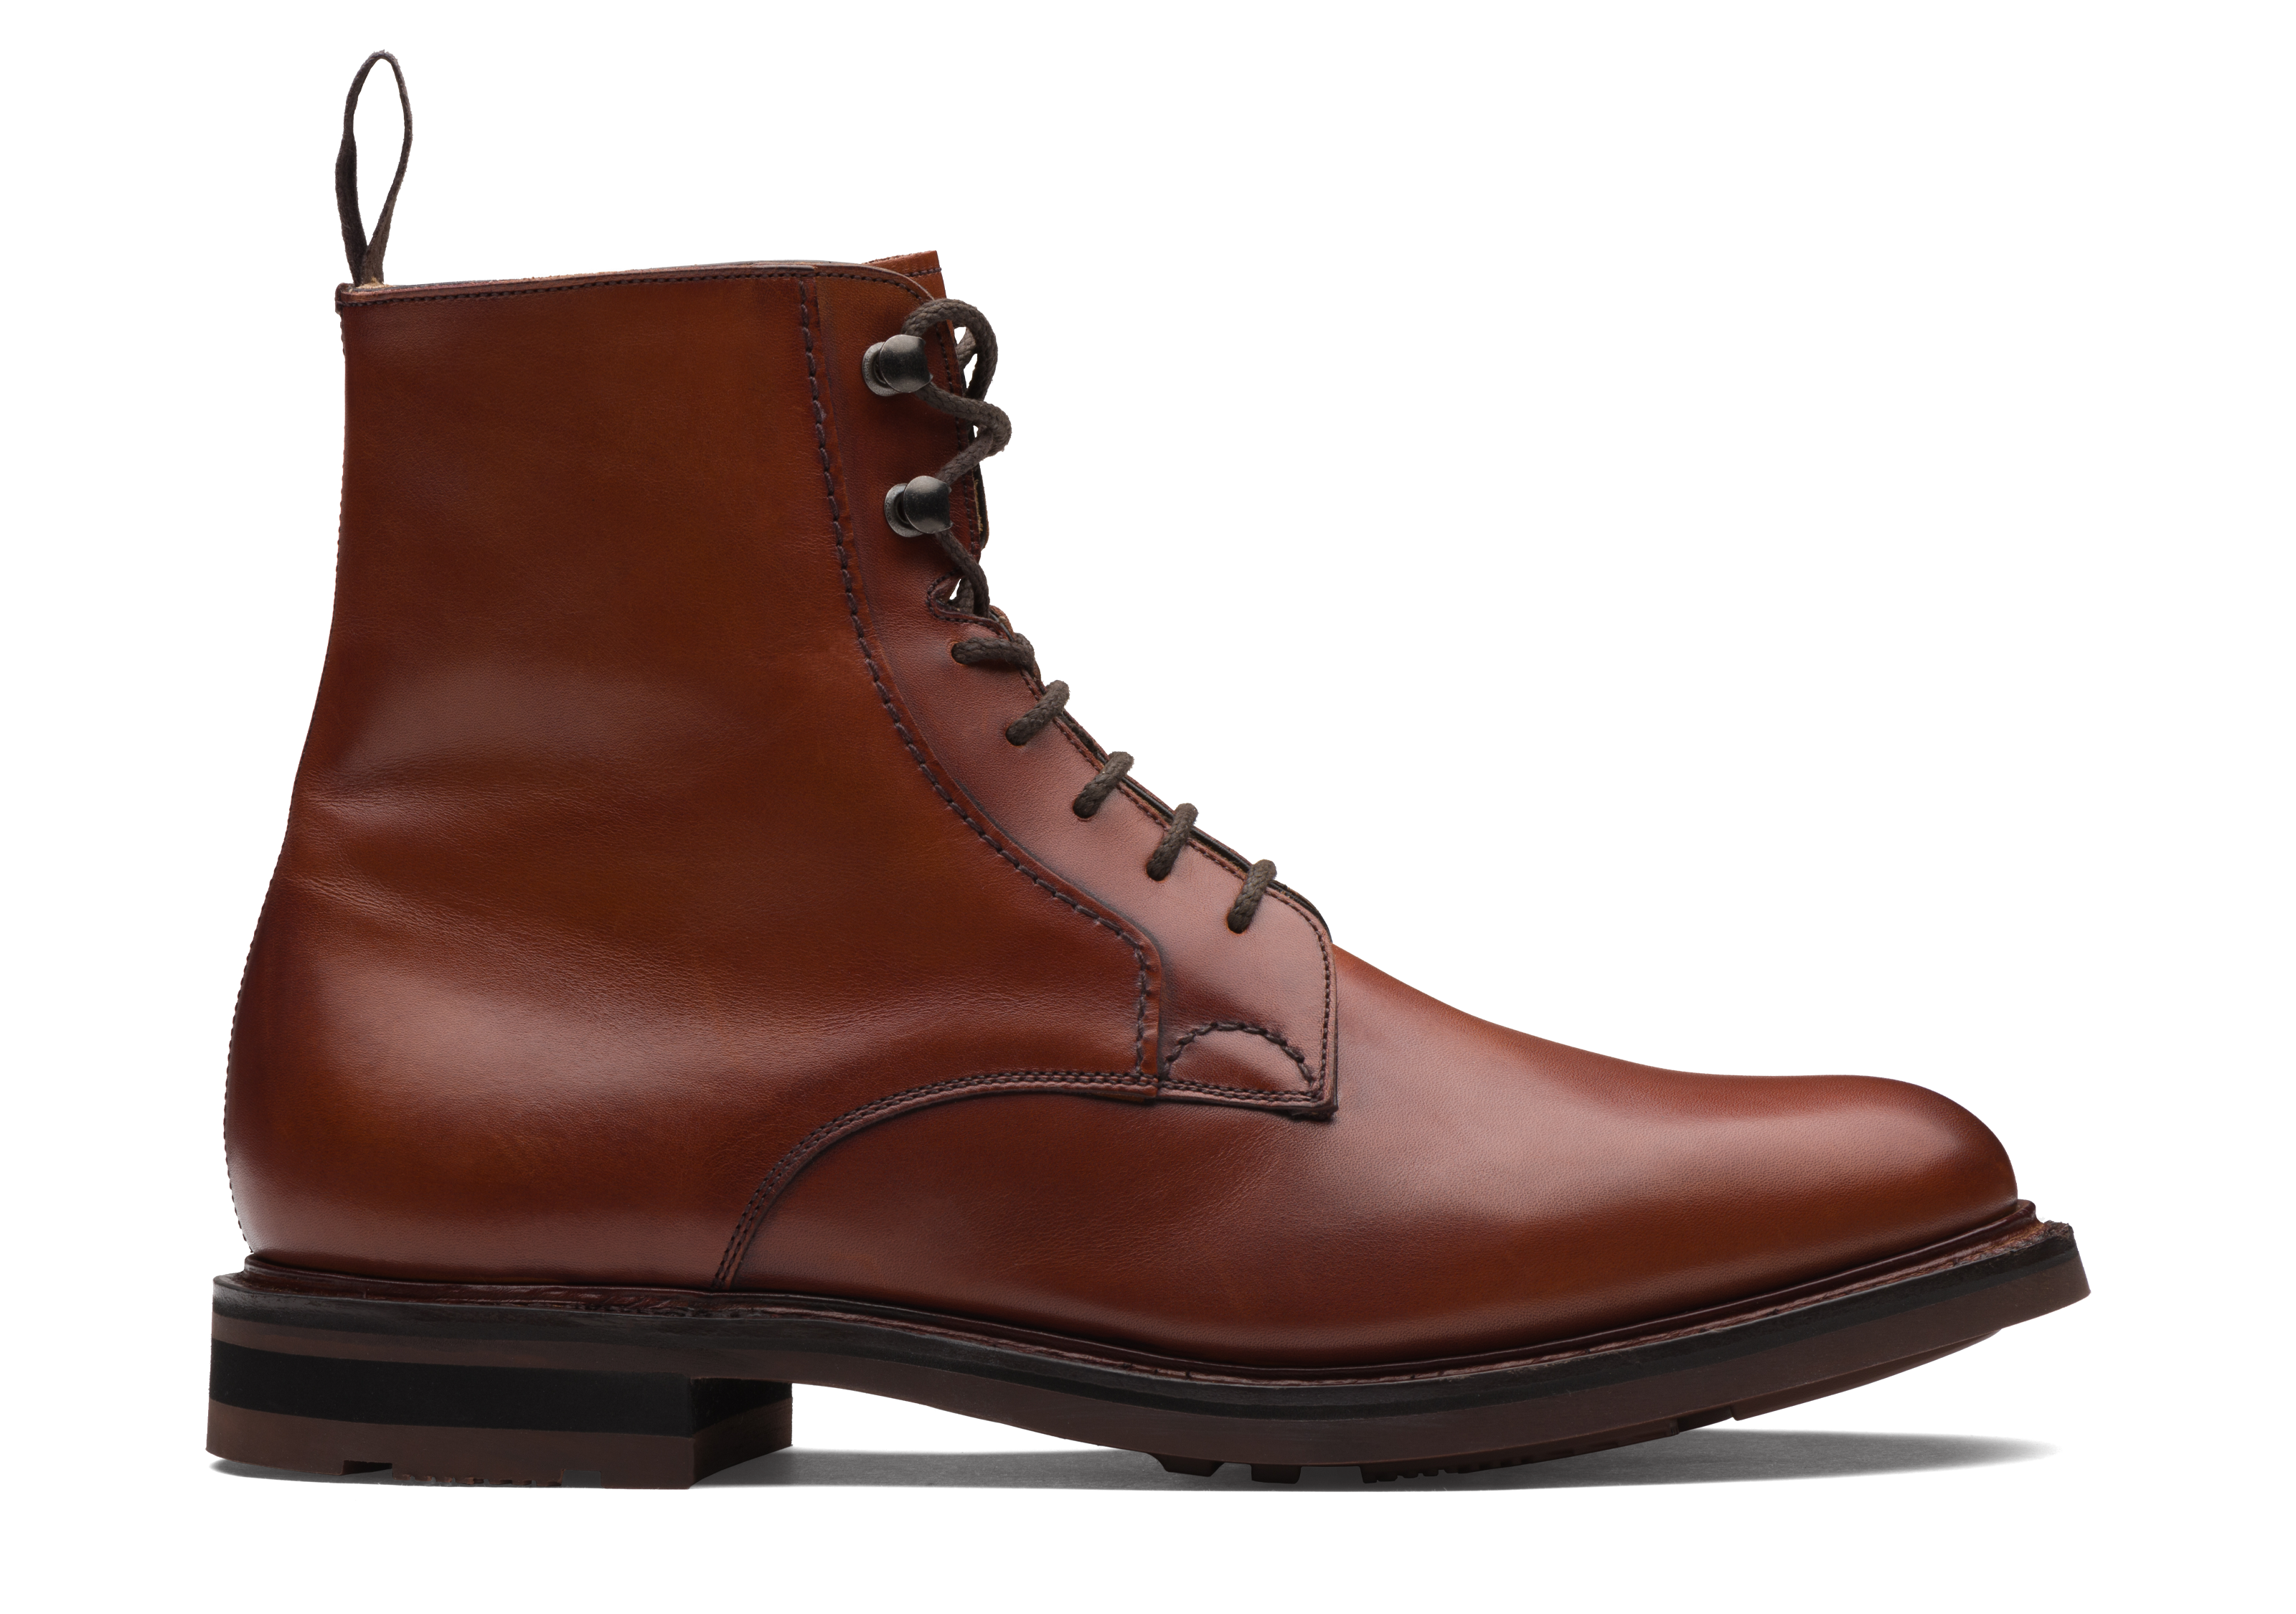 697aeff683c Men's Designer Boots: Chelsea, Brogue, Desert | Church's